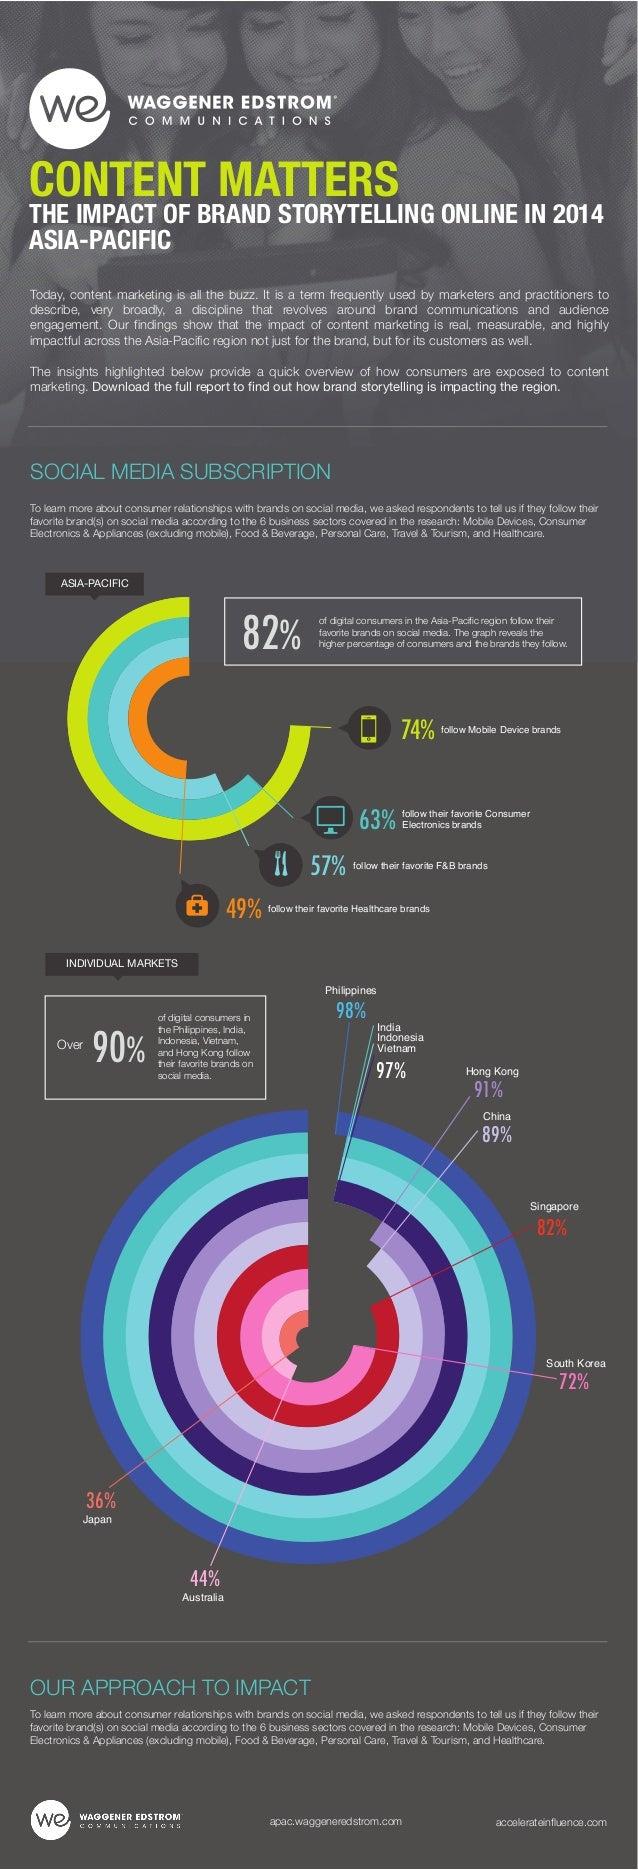 82% 74% 63% 57% 49%  follow Mobile Device brands  follow their favorite Consumer Electronics brands  follow their favorite...